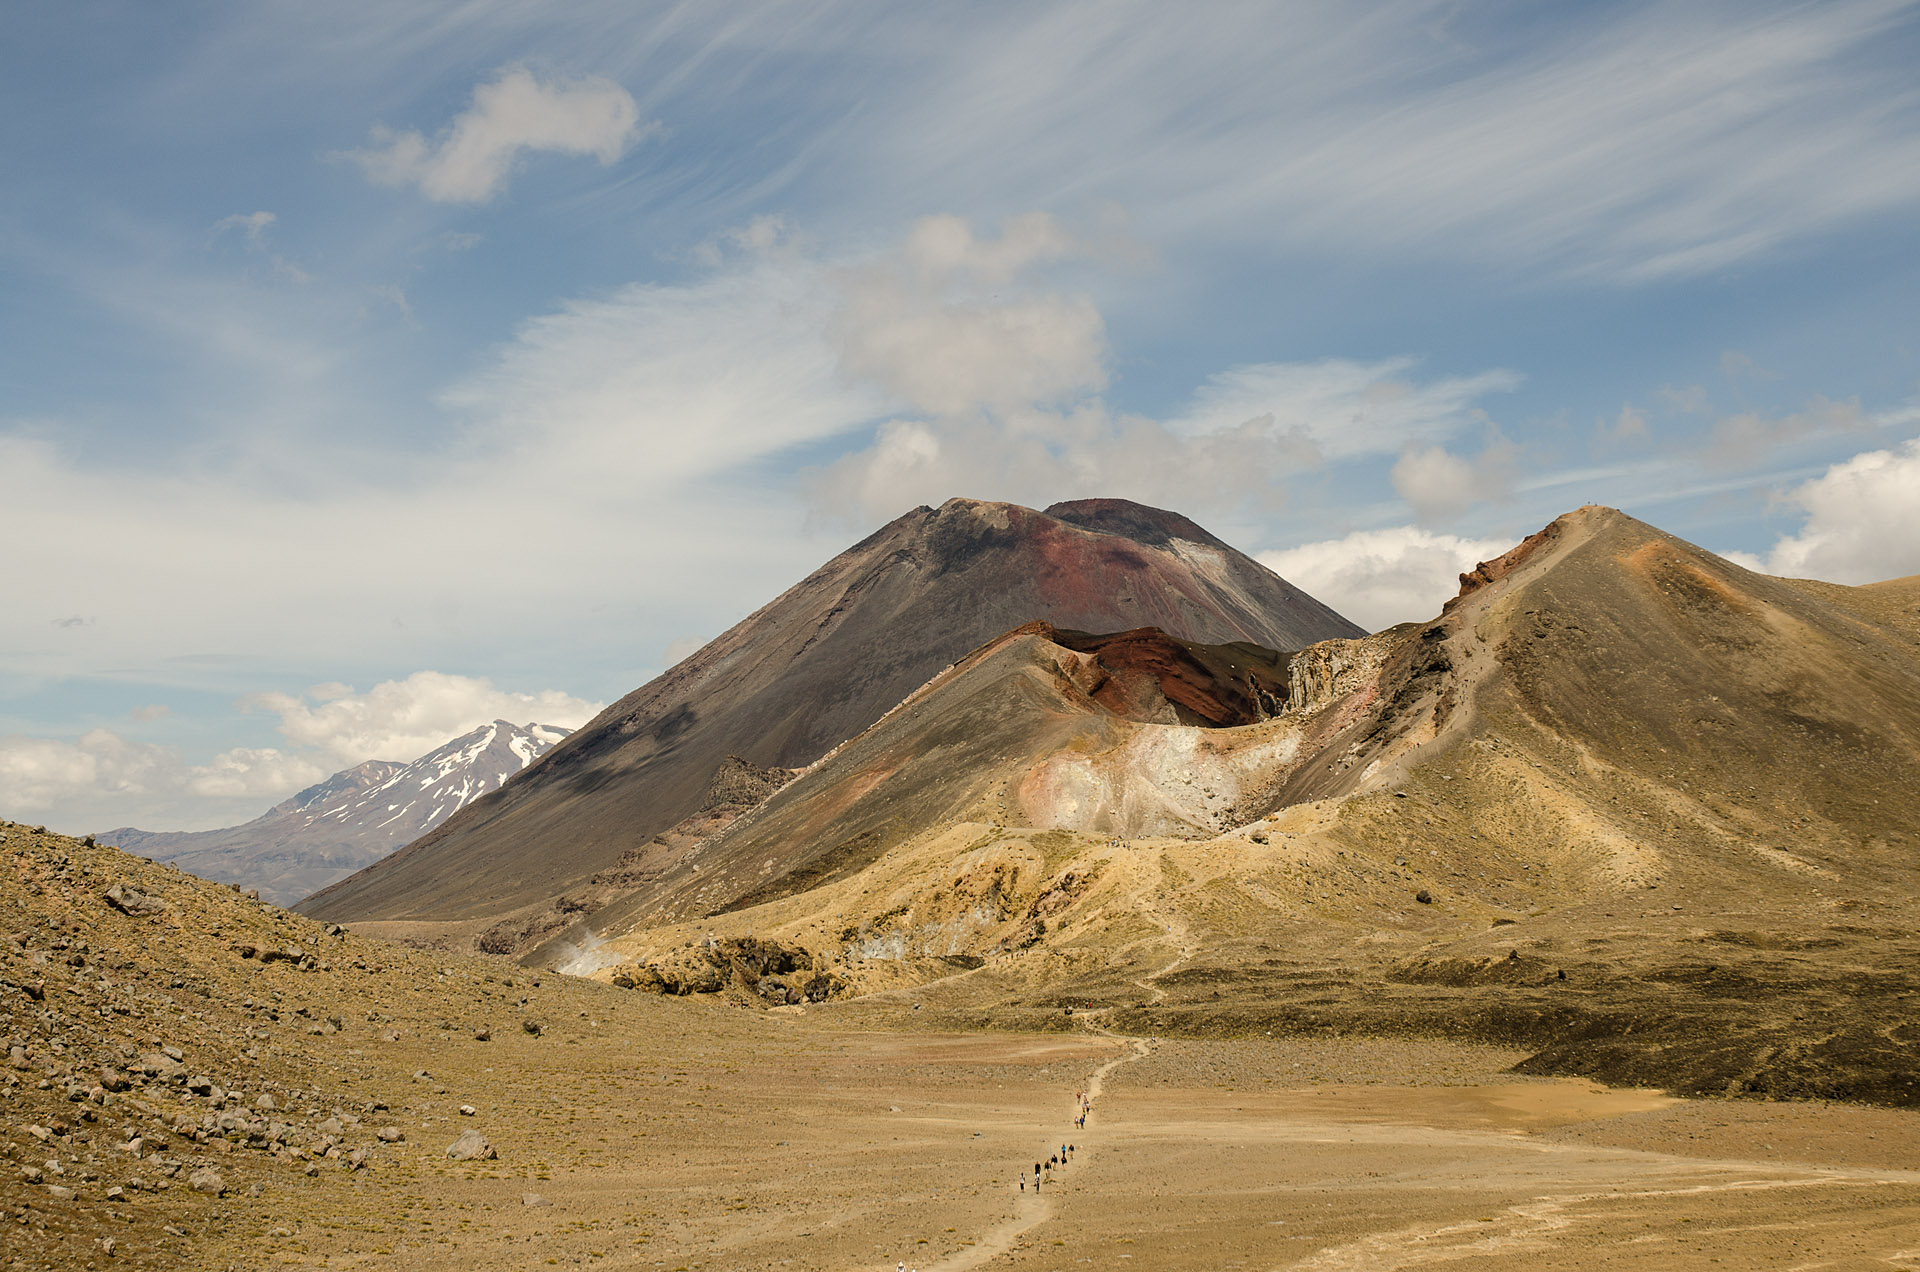 Red Crater, Mount Ngauruhoe & Mount Ruapehu